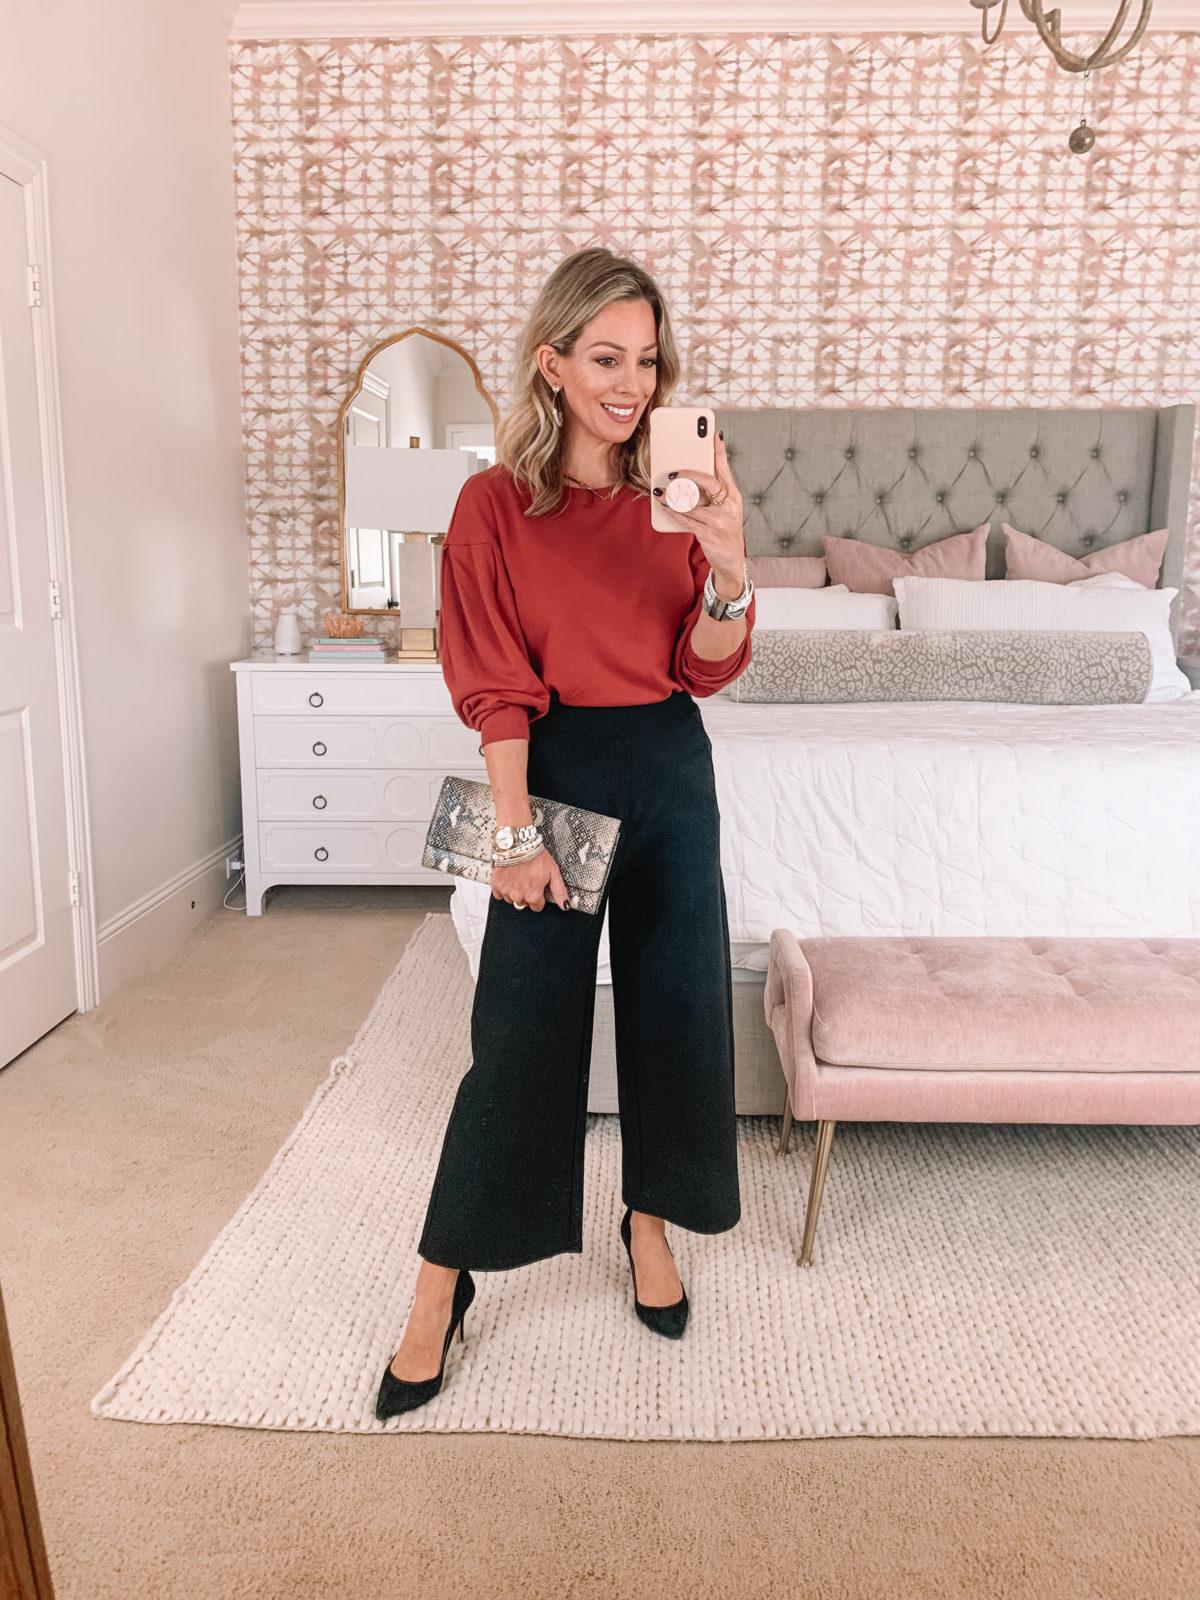 Amazon Fashion Faves, Puff sleeve top, wide leg pants, heels, snakeskin clutch